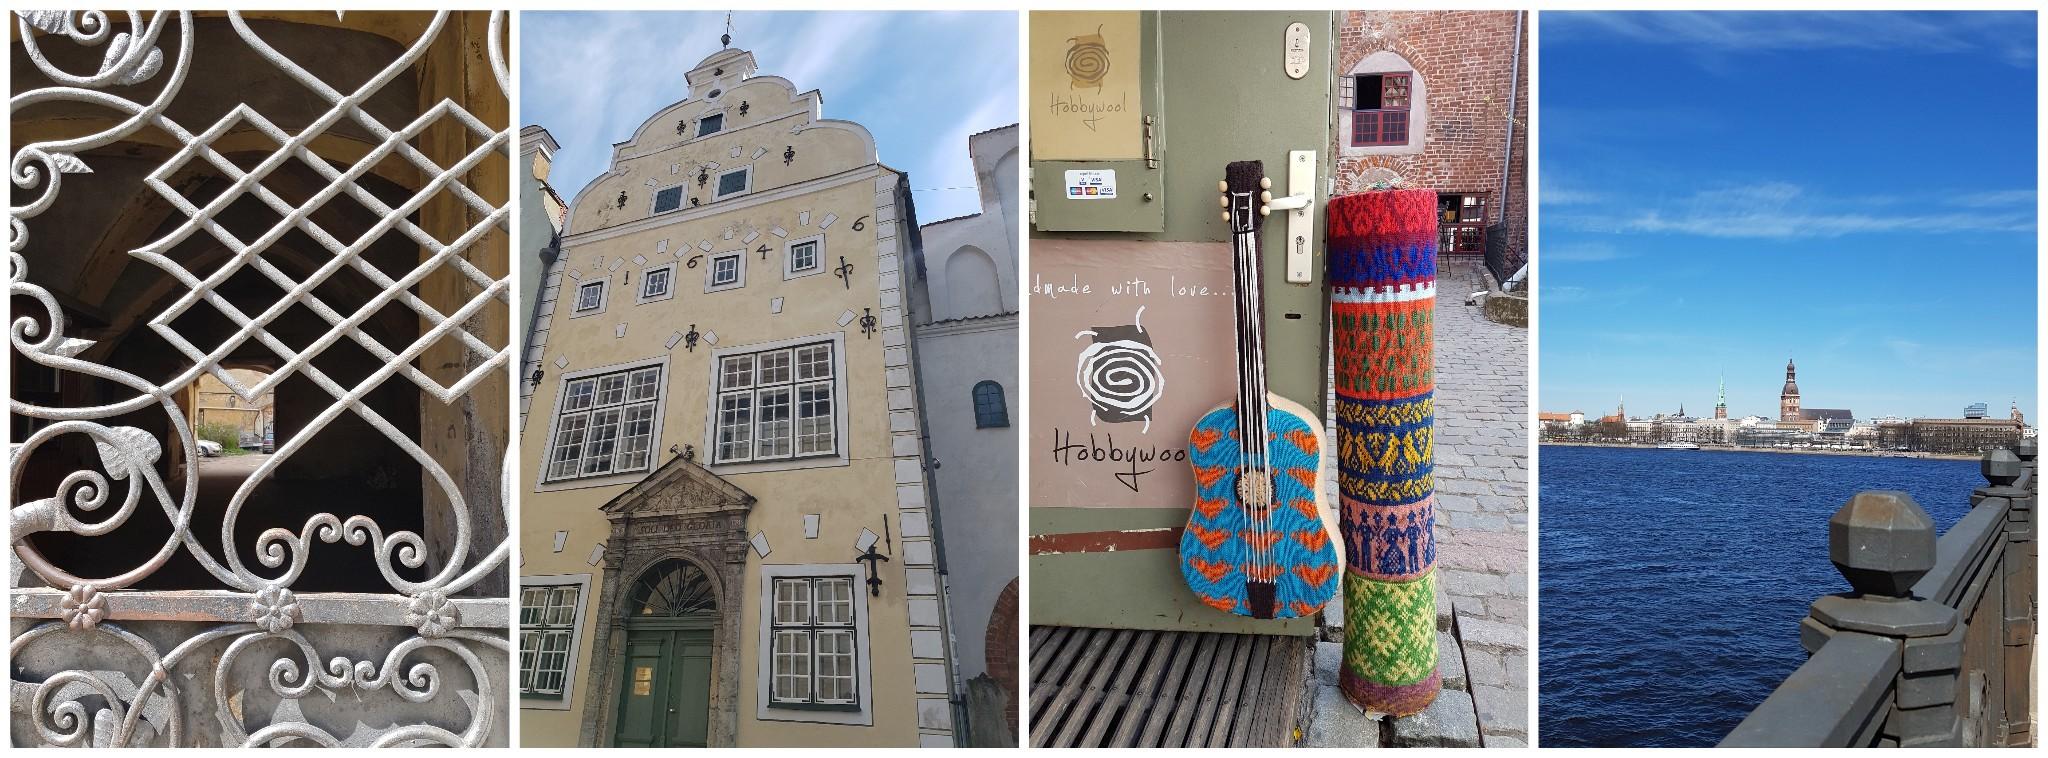 Stadtspaziergang durch Rigas Altstadt